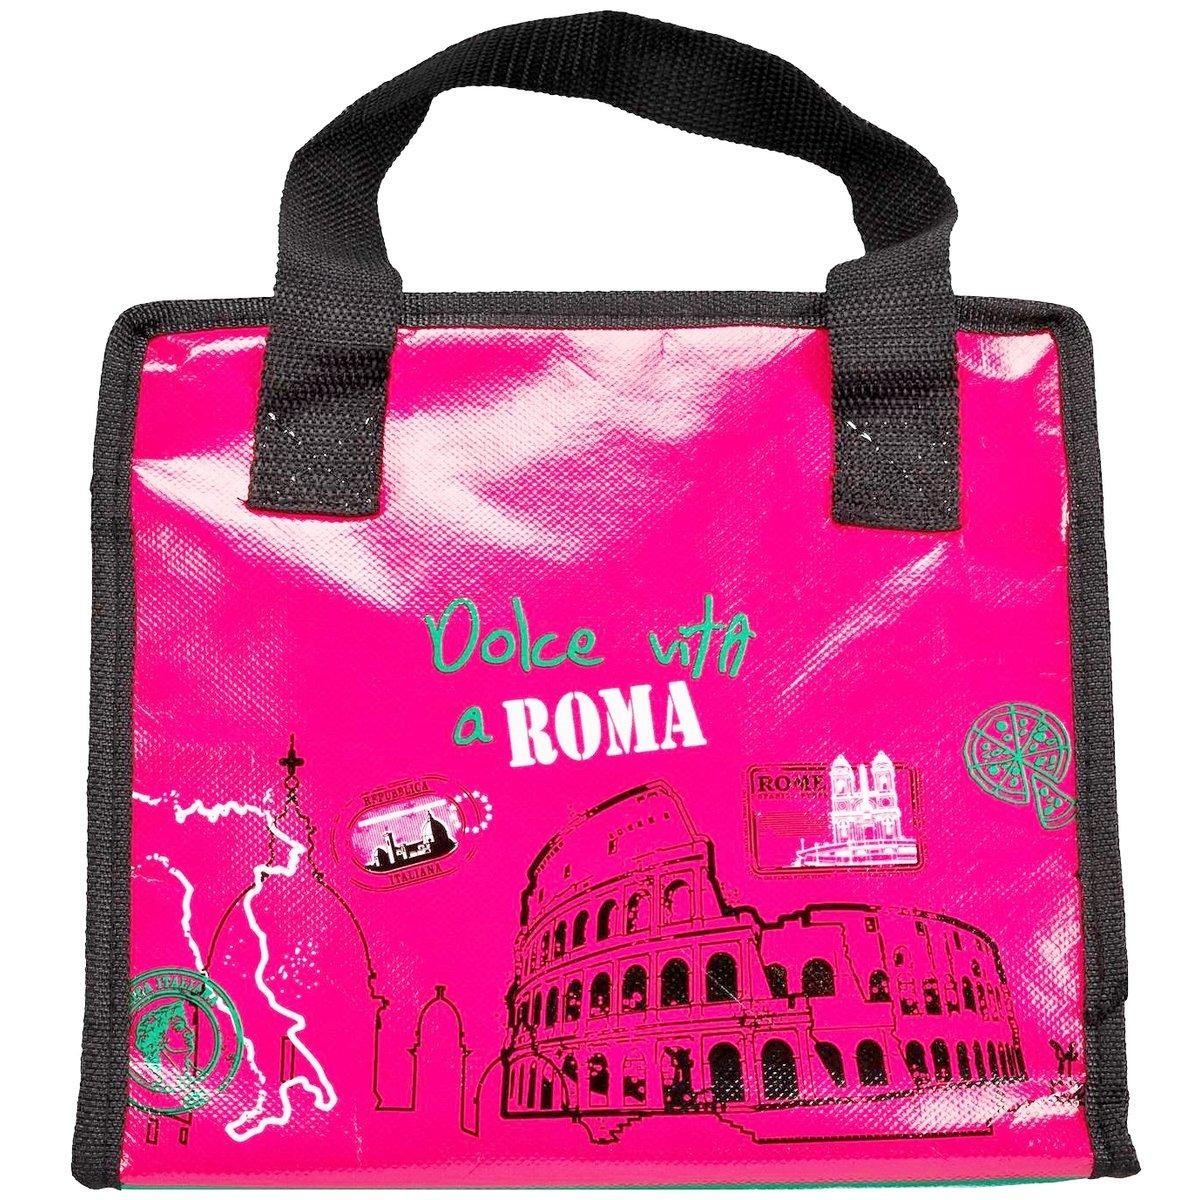 Lunch Bag Sac Panier Repas Fraicheur Isotherme City Dolce Vita /à Rome Promobo